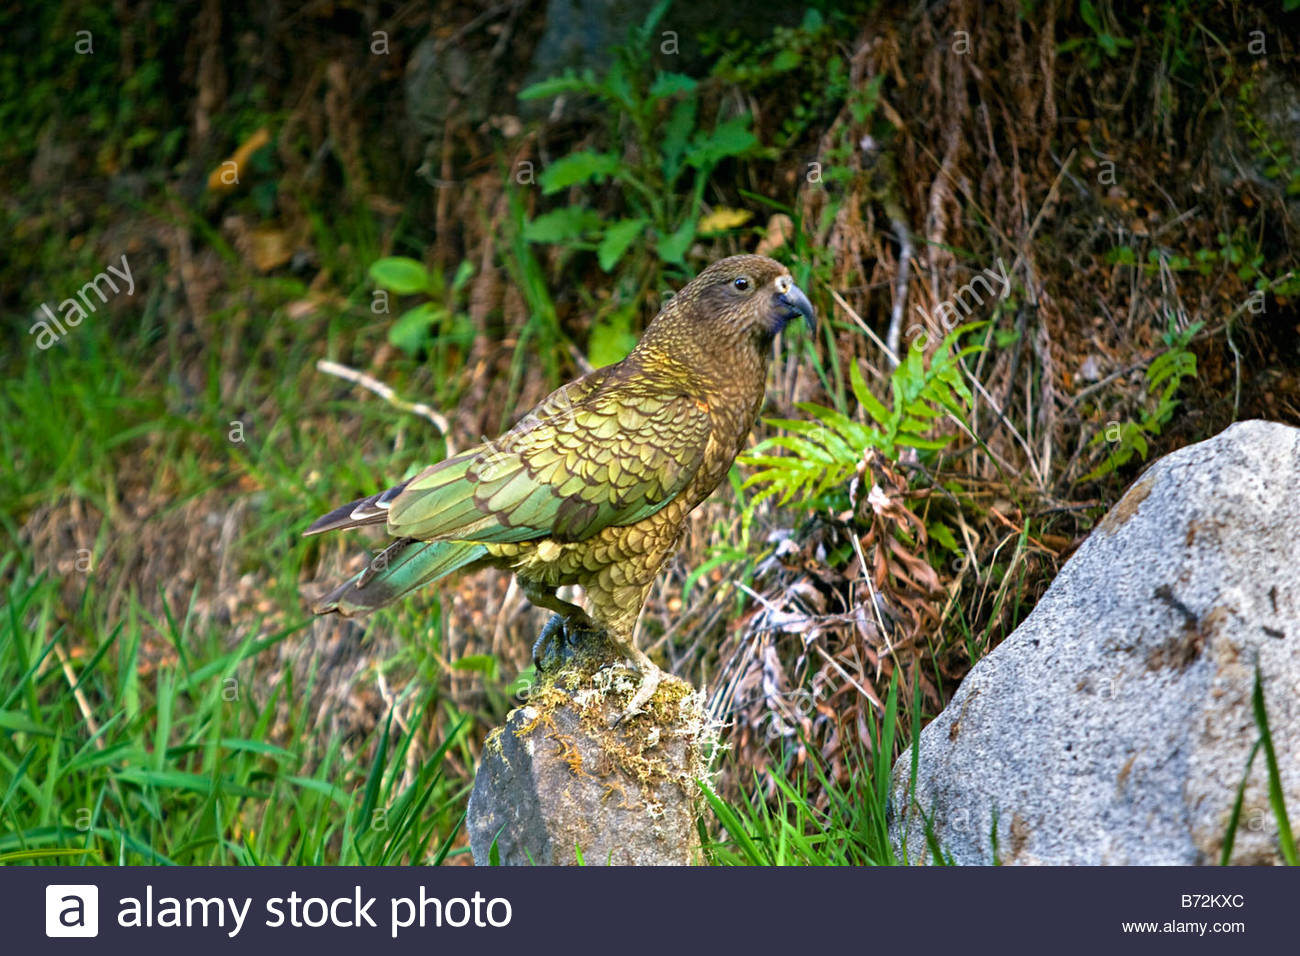 Neuseeland, Südinsel, Queenstown, Vogel der KEA, Nestor Notabilis. Stockbild